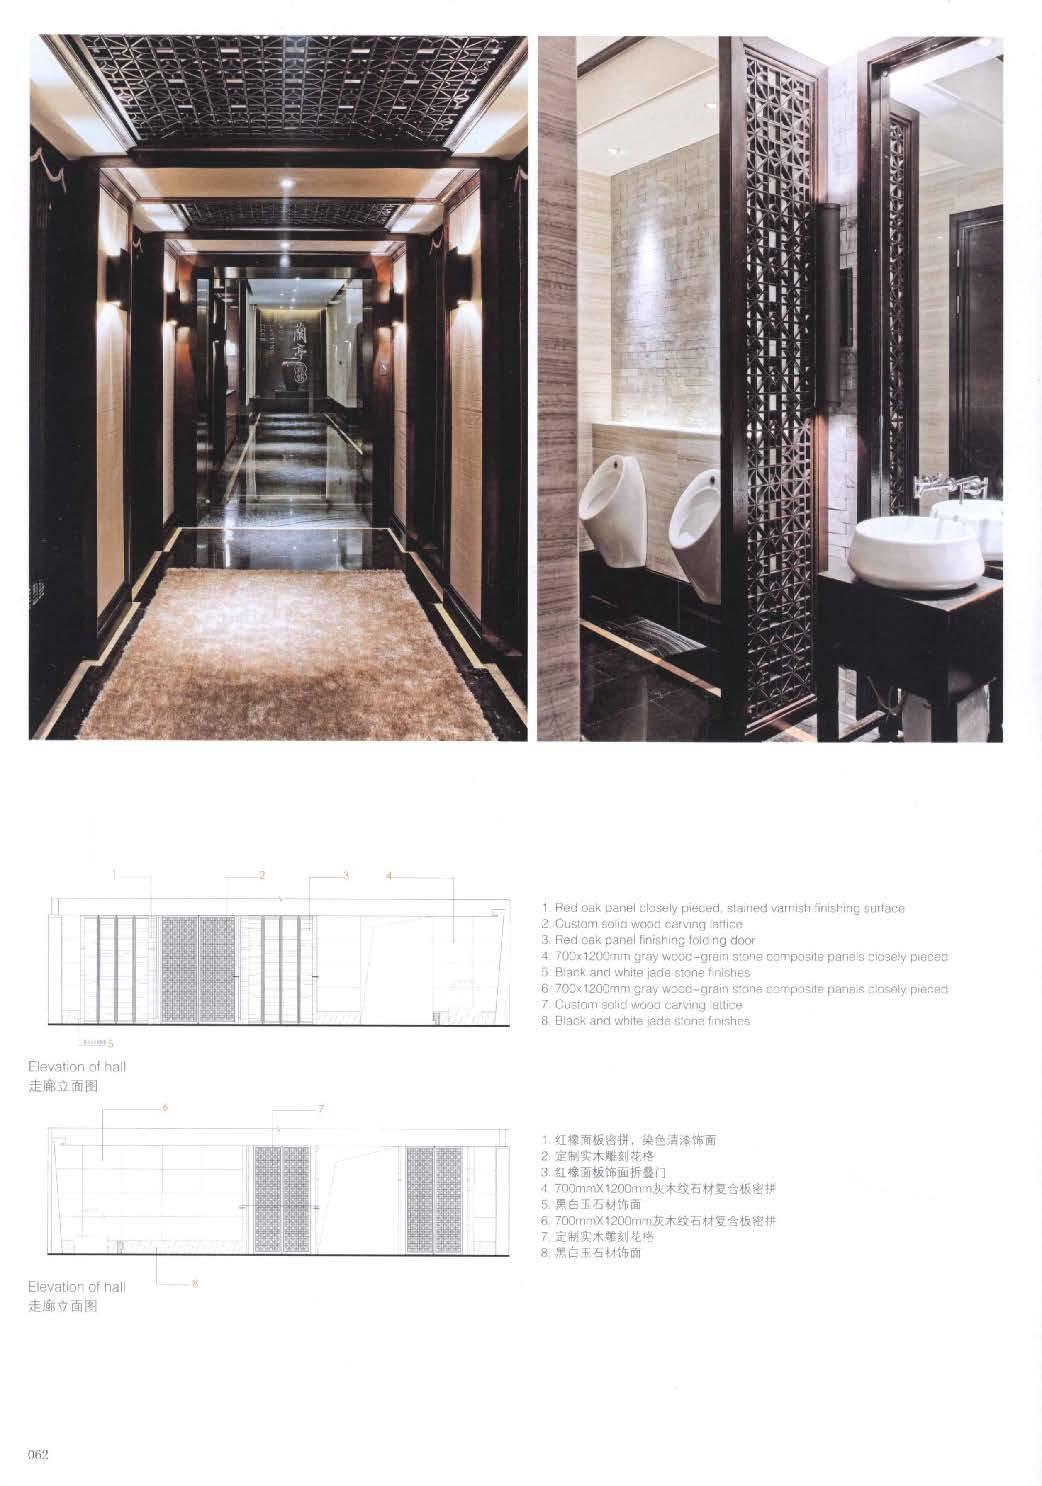 H073 东方风情 会所、餐饮细部解析_Page_060.jpg